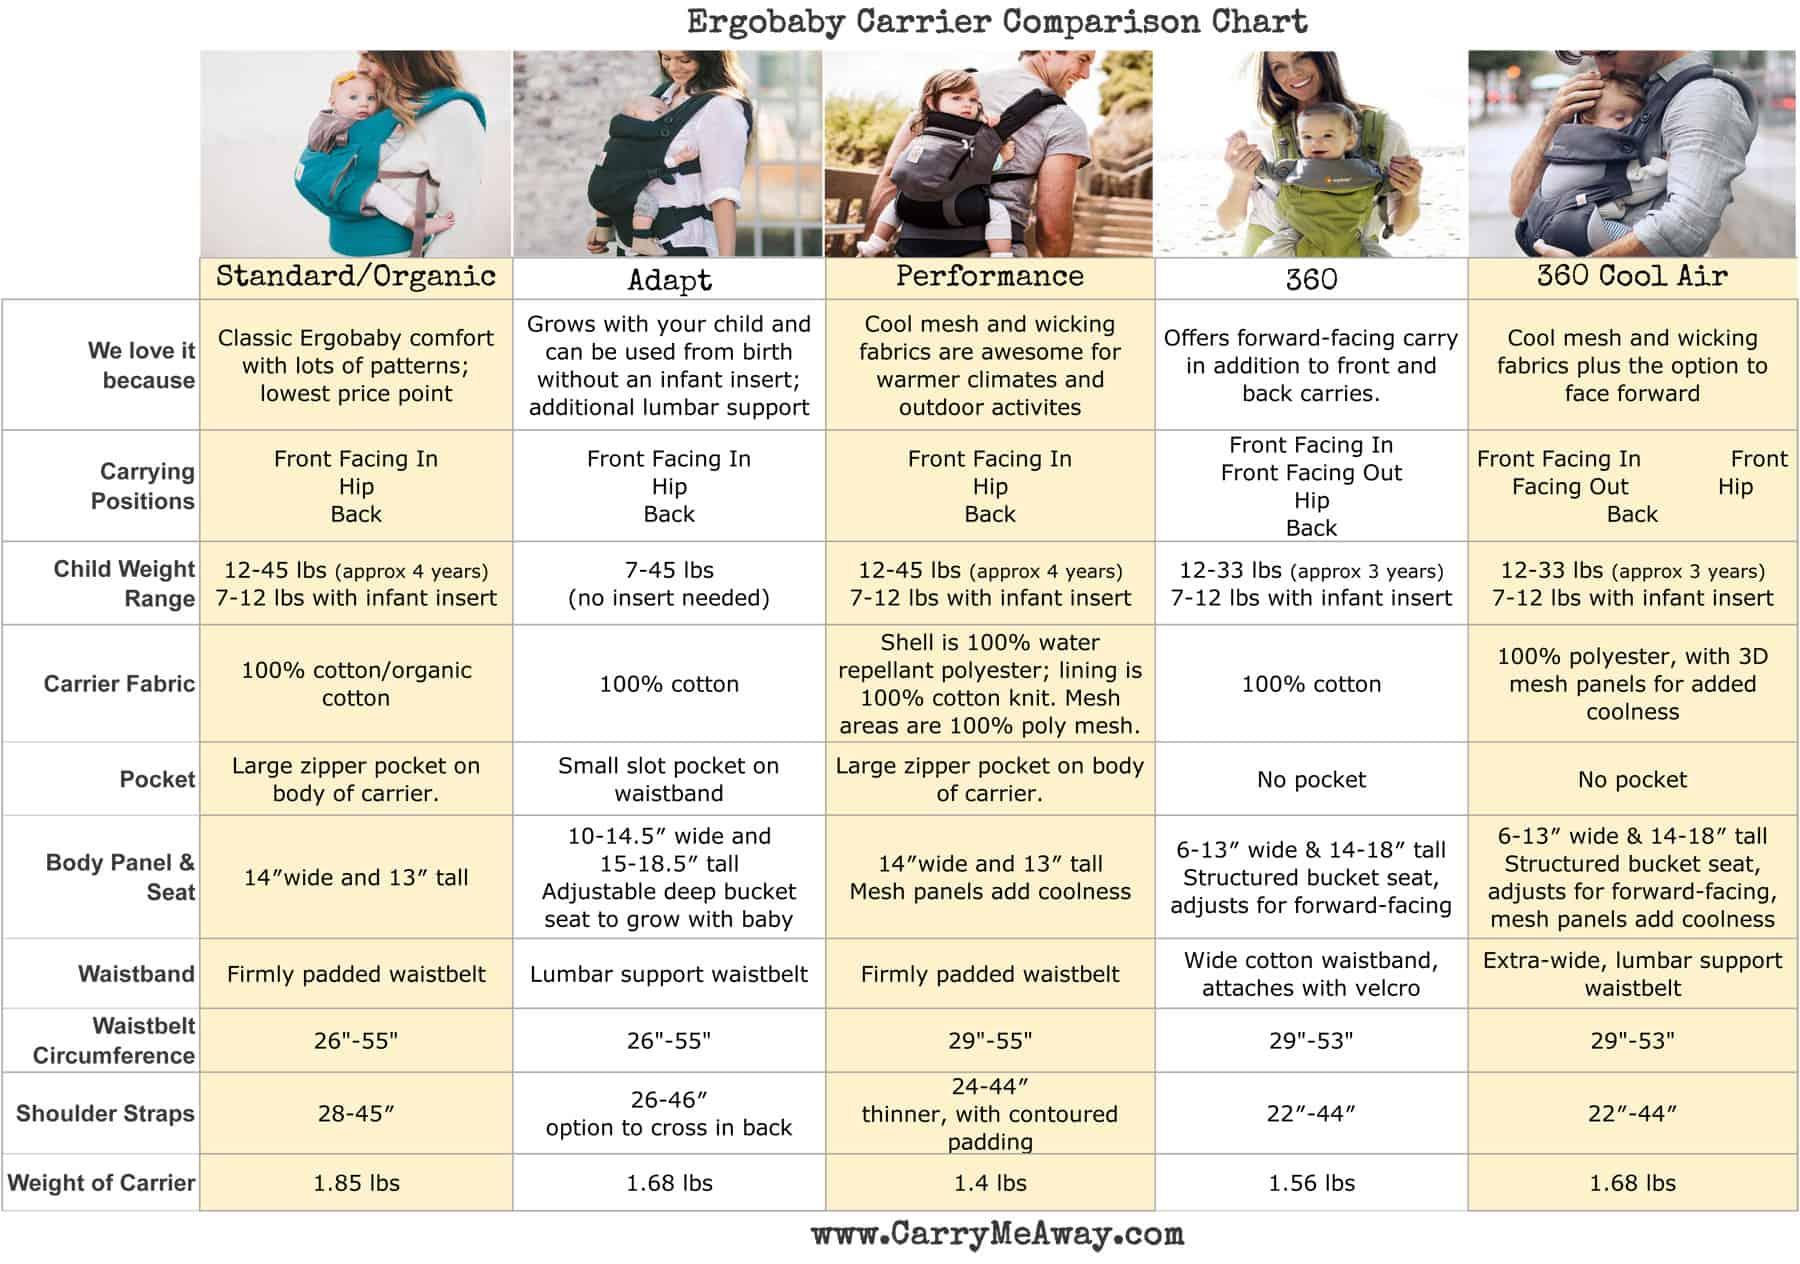 Ergo Comparison Chart Standard Performance 360 Adapt Carry